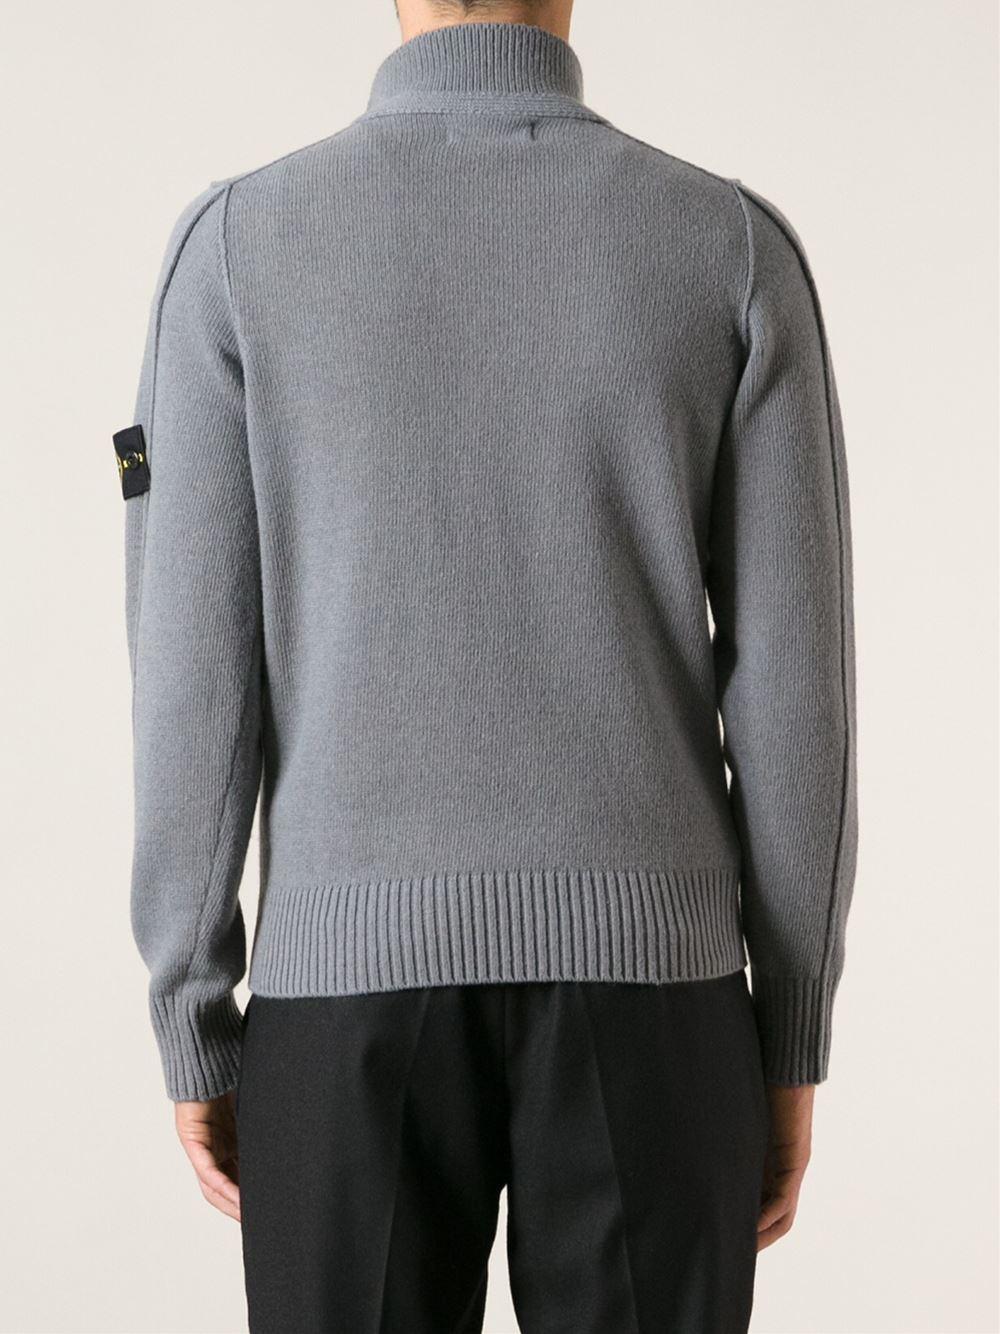 lyst stone island quarter placket sweater in gray for men. Black Bedroom Furniture Sets. Home Design Ideas